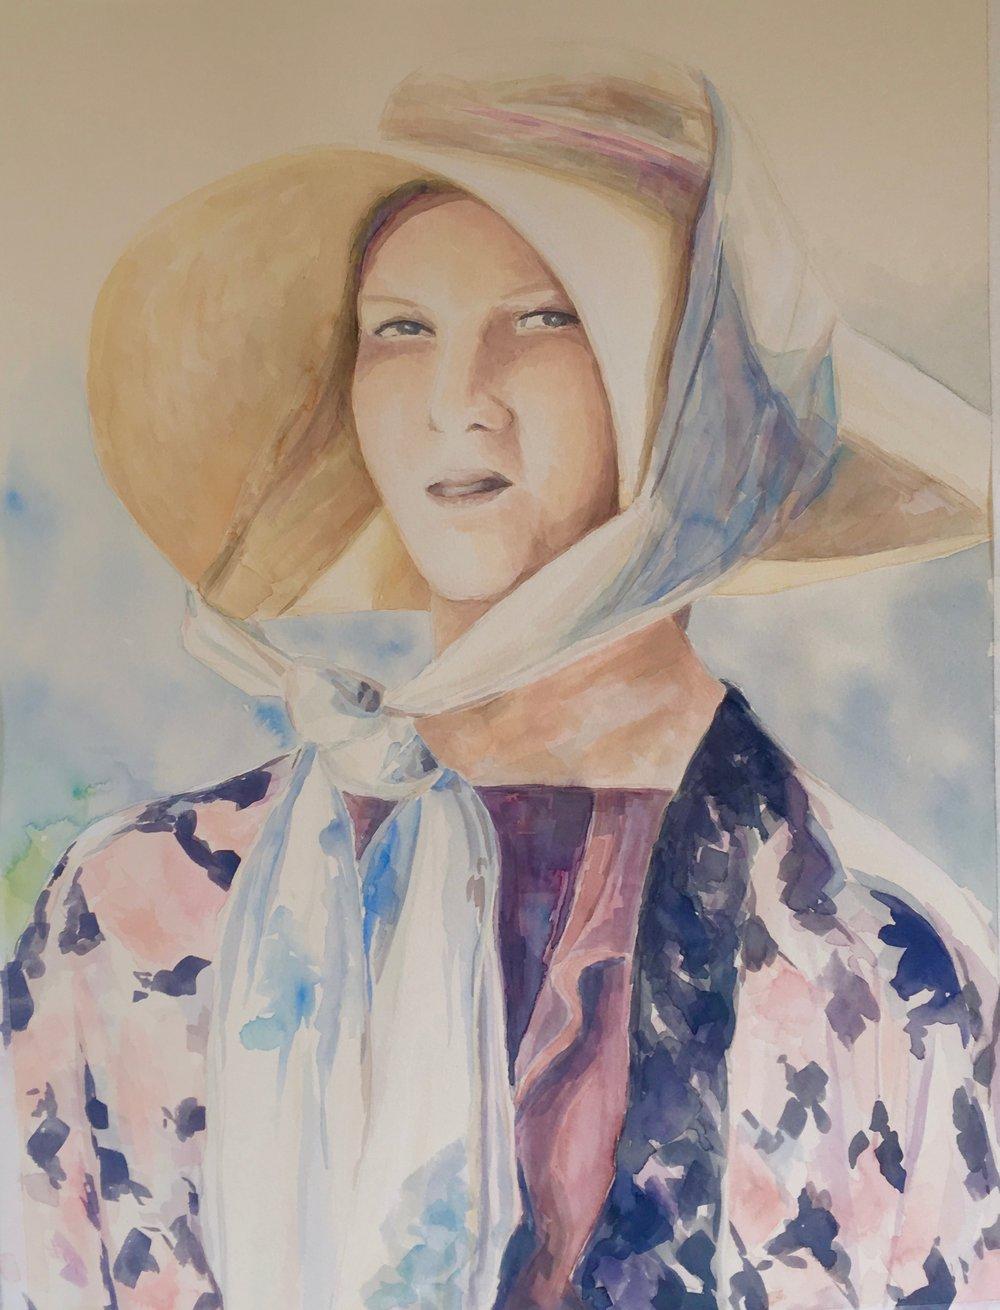 Daria in her Bonnet